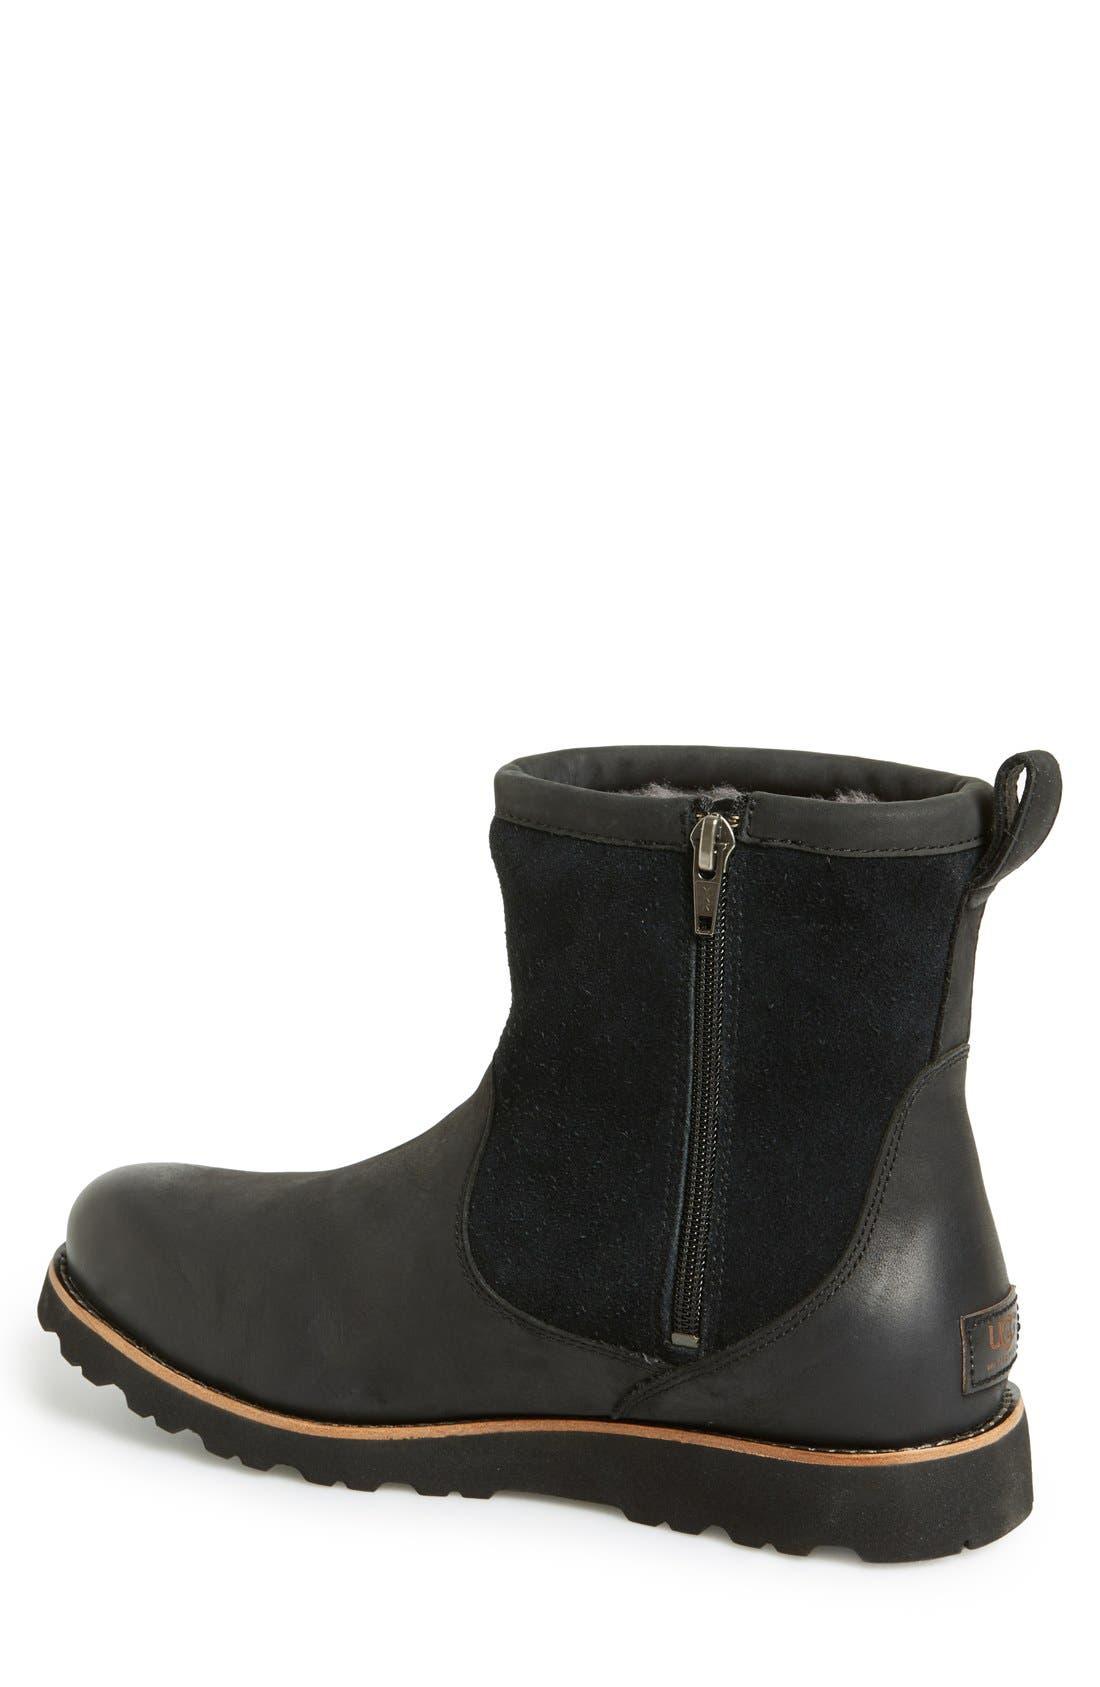 Hendren TL Waterproof Zip Boot,                             Alternate thumbnail 2, color,                             Black